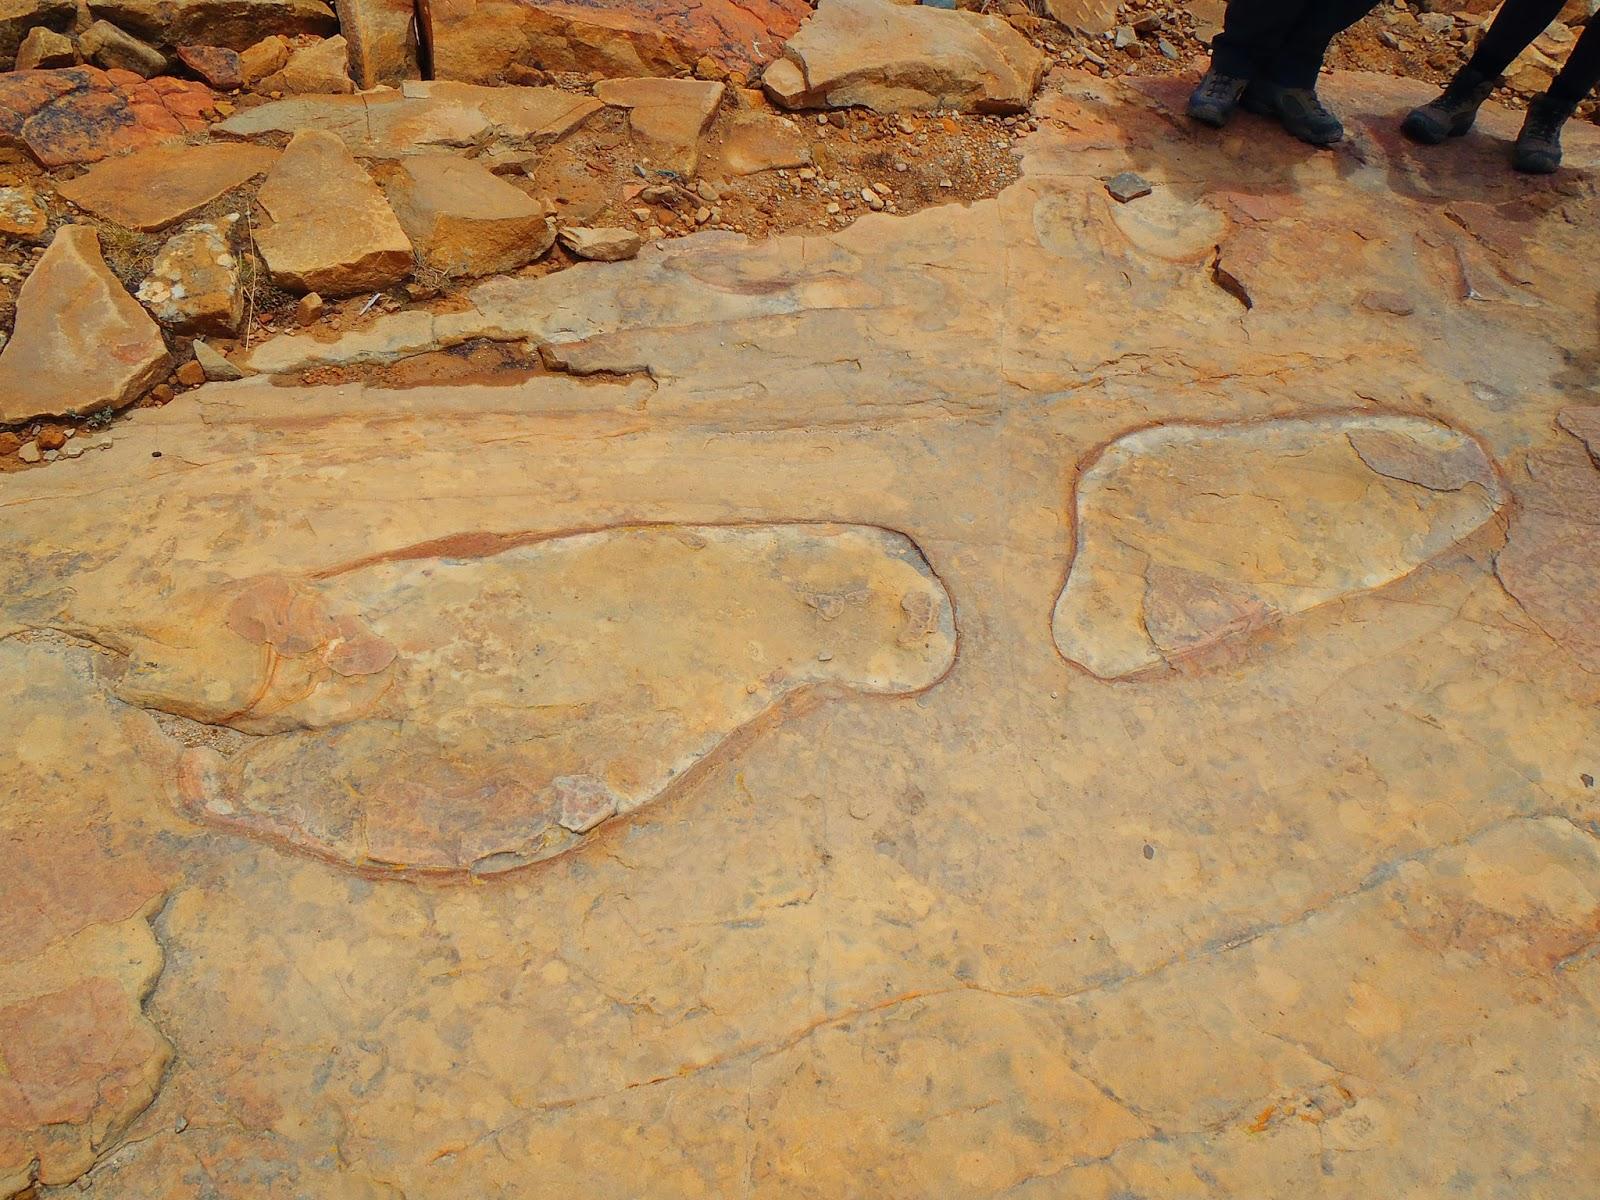 Isla del sol footprint fossils